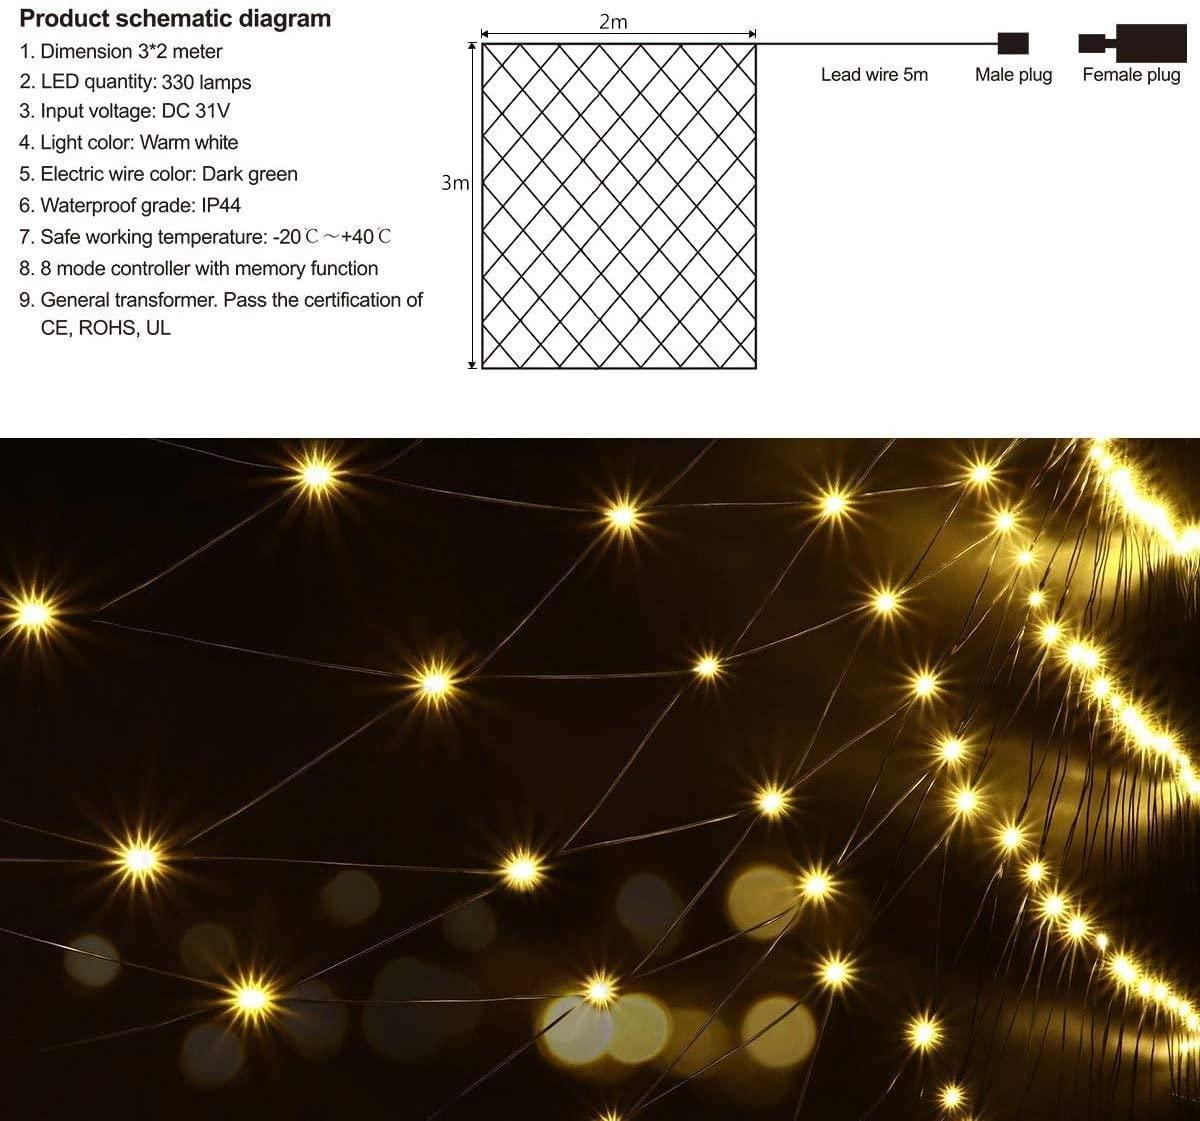 Christmas Net Lights, LED Net Lights Outdoor Christmas Tree Wrap Lights for Christmas Party Decorations